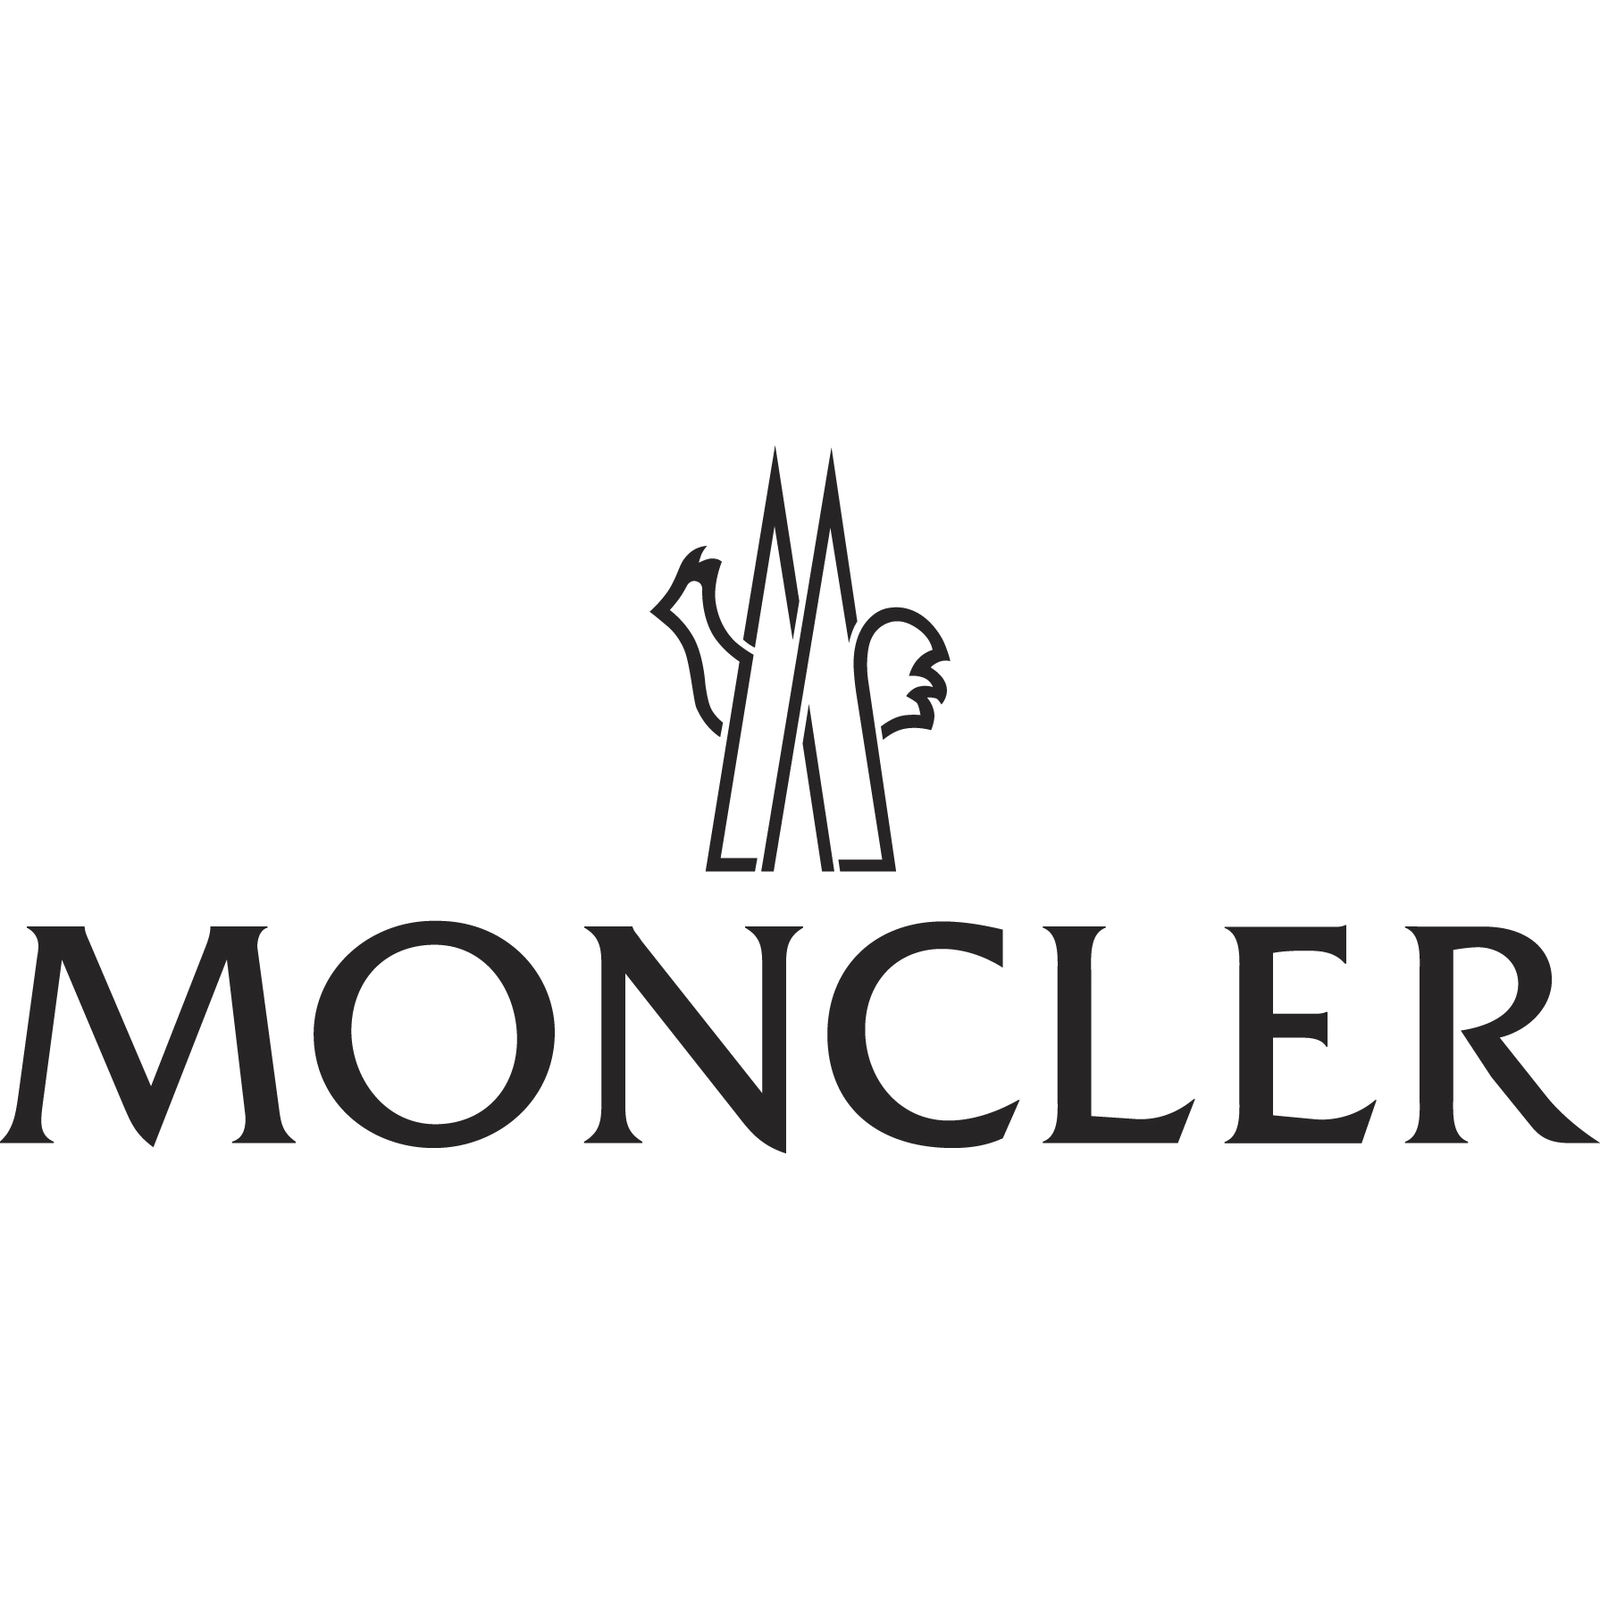 MONCLER (Bild 1)